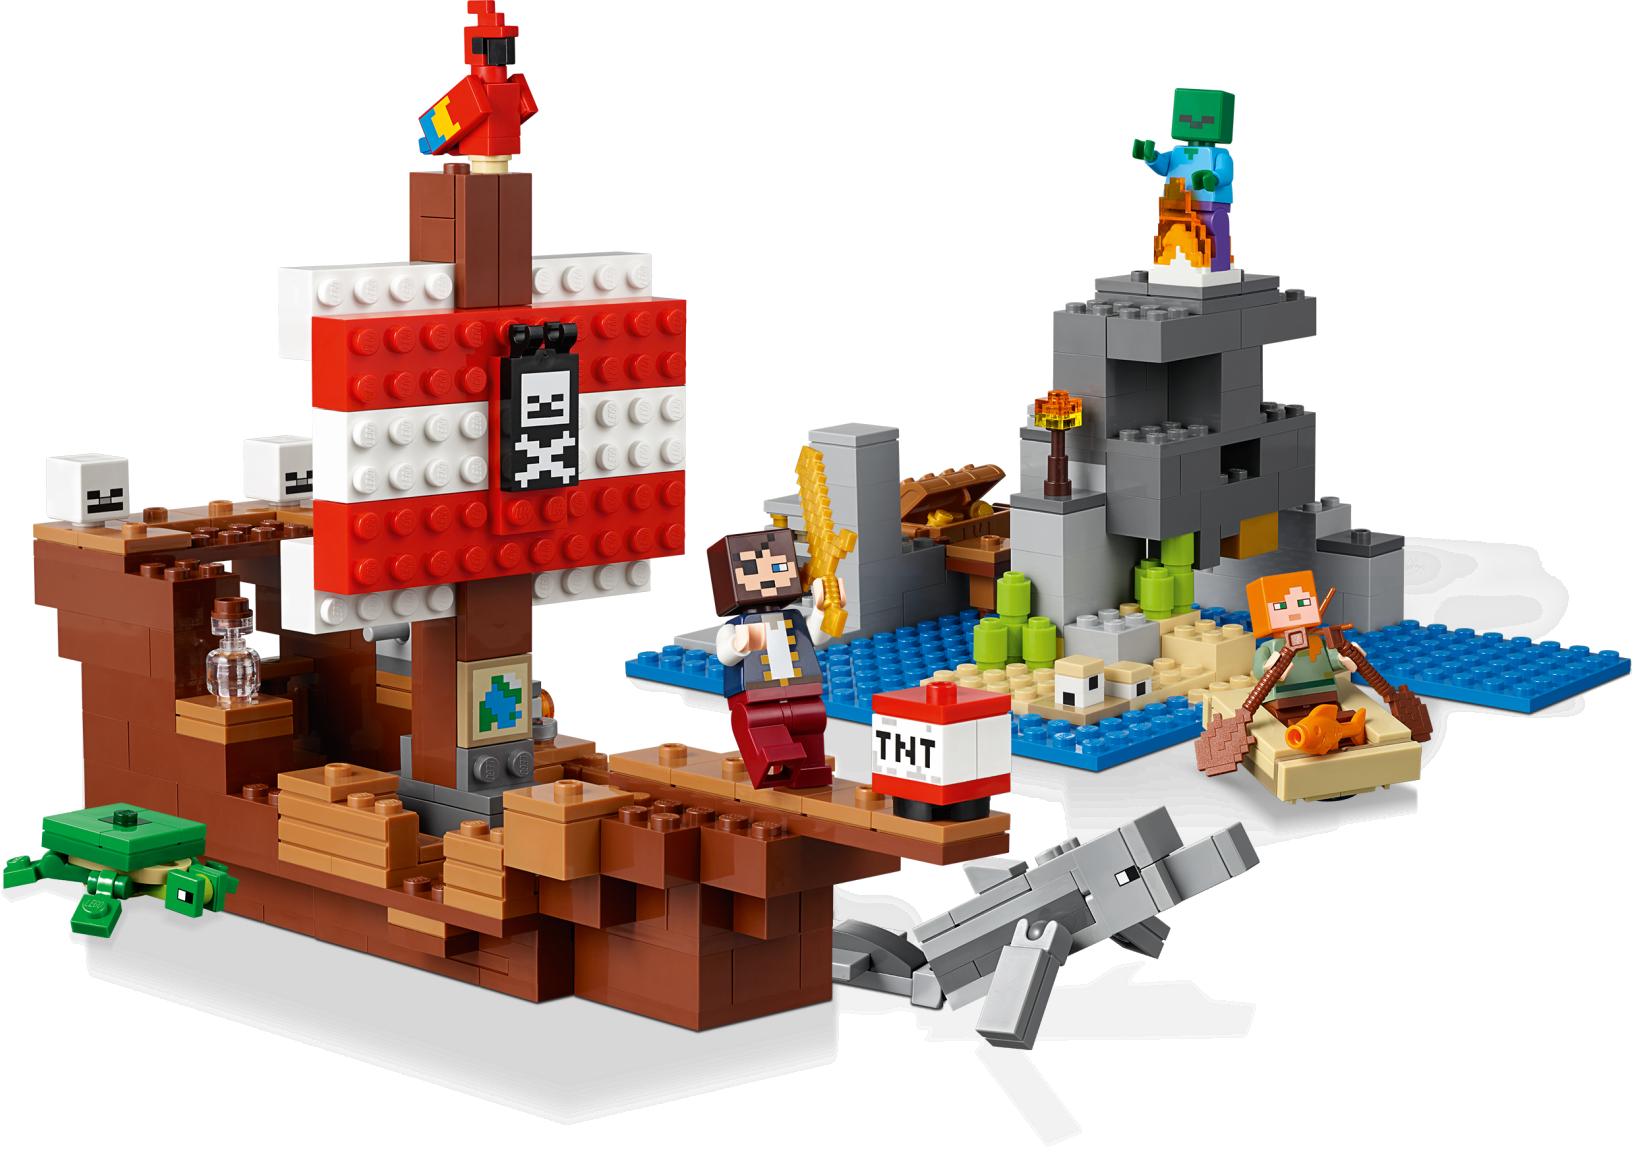 The Pirate Ship Adventure